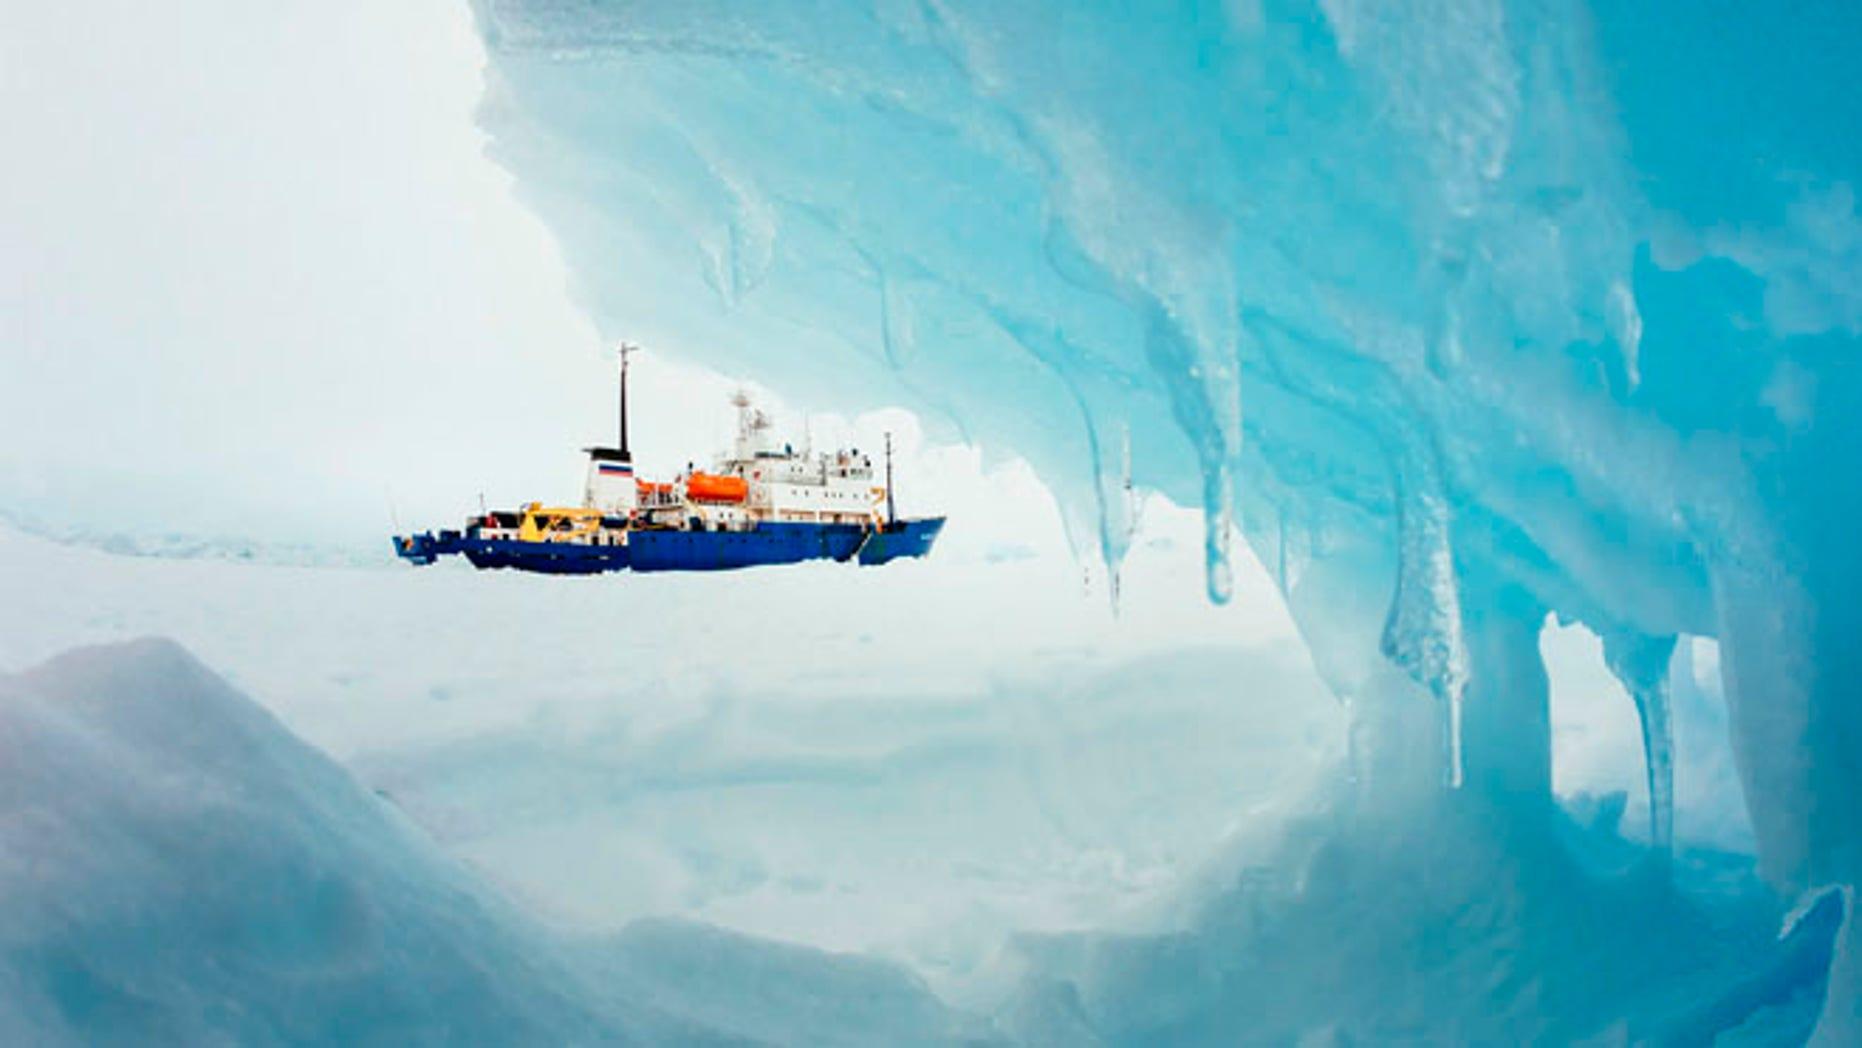 Dec. 29, 2013: The MV Akademik Shokalskiy is pictured stranded in ice in Antarctica.